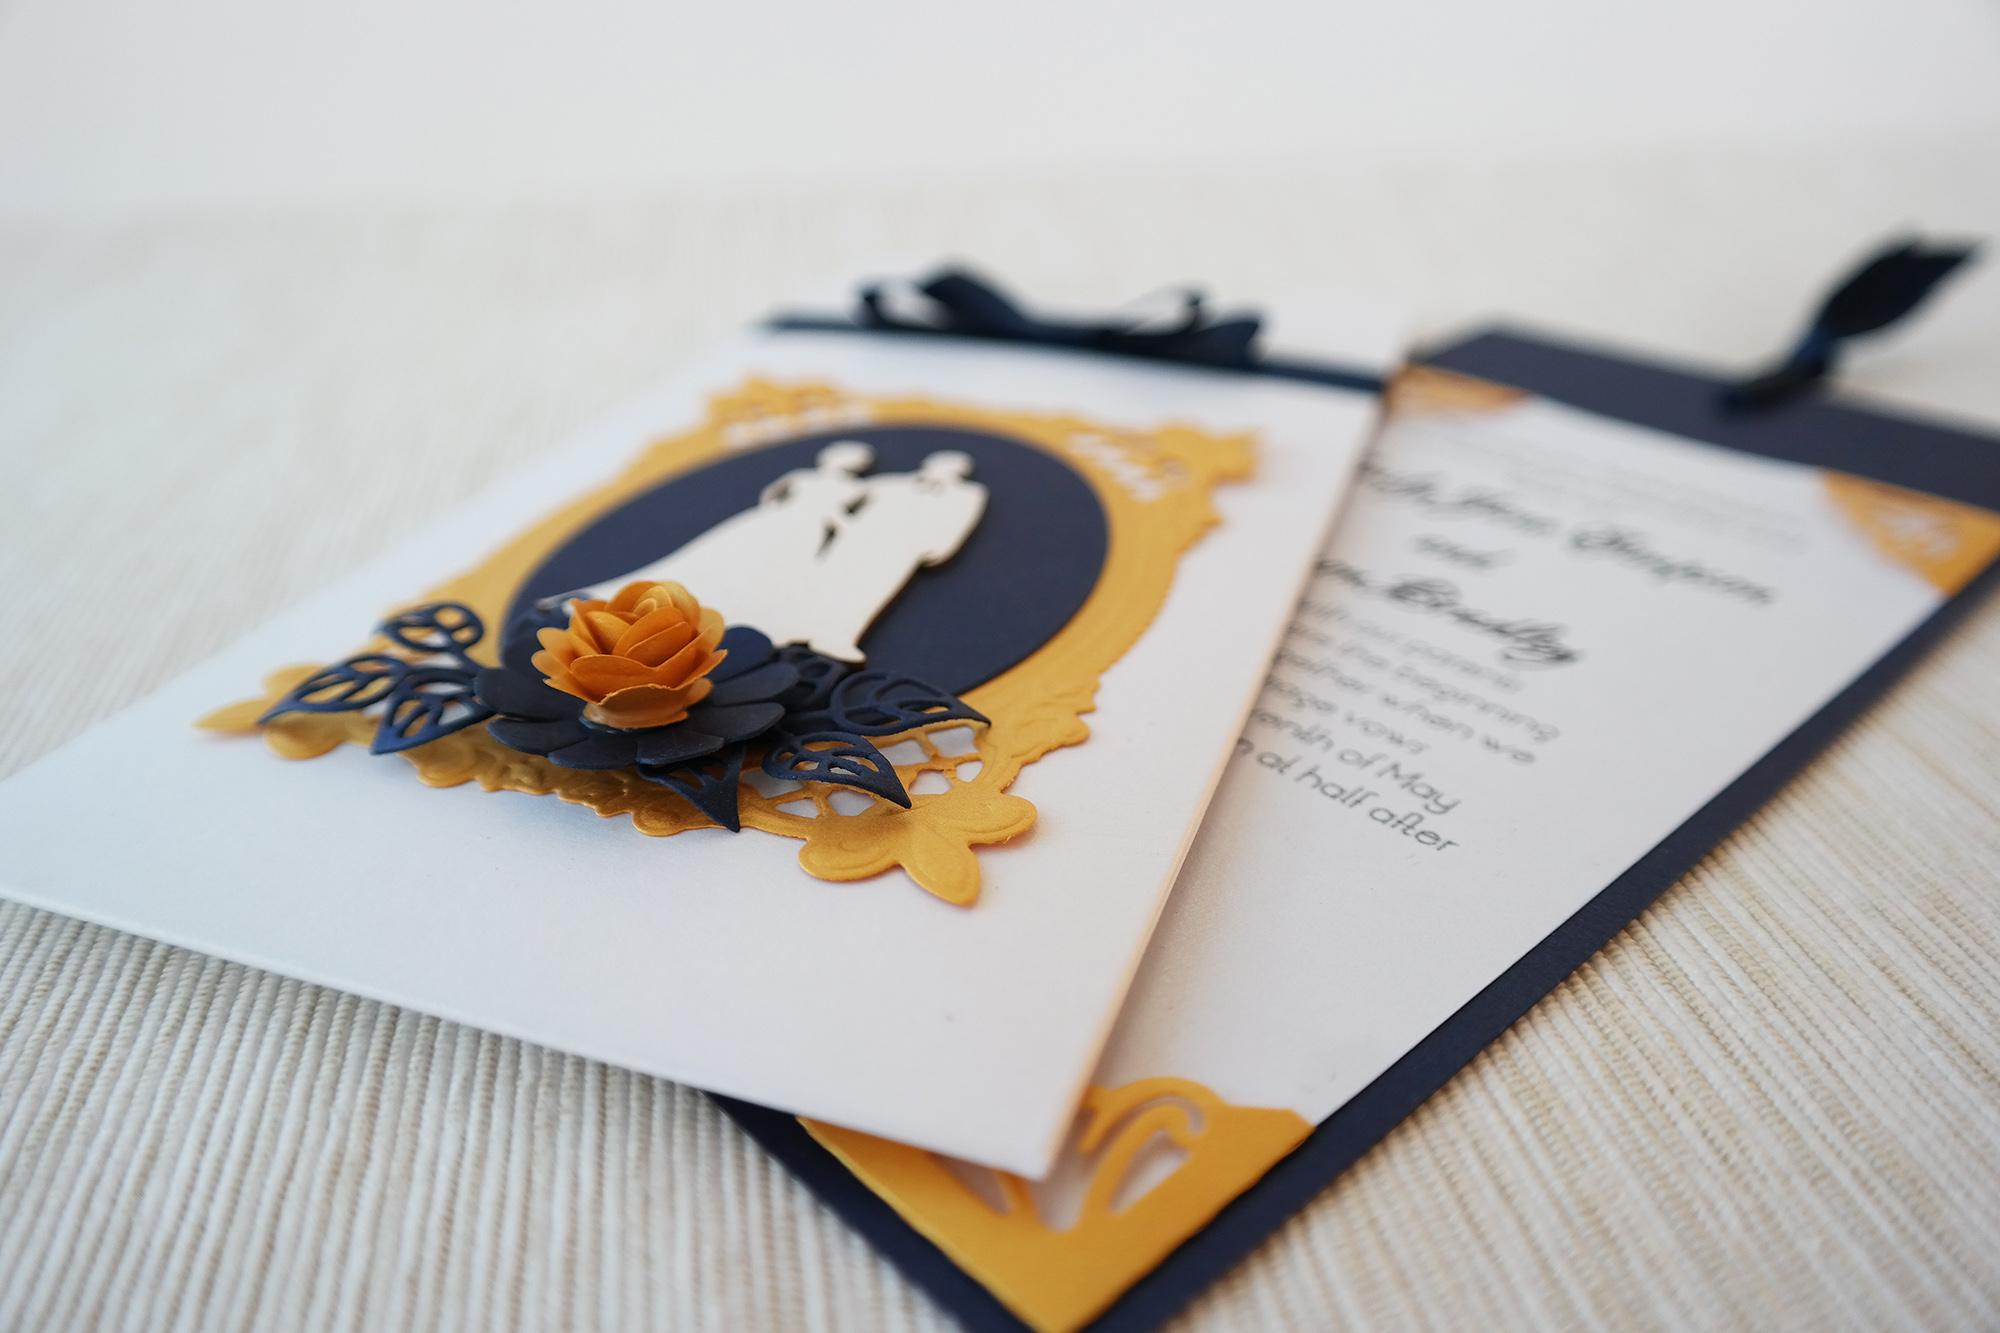 vestuvinis kvietimas, kvietimas vokelyje, istraukiamas kvietimas, pocket fold invitation, wedding invitation, royal wedding invitation